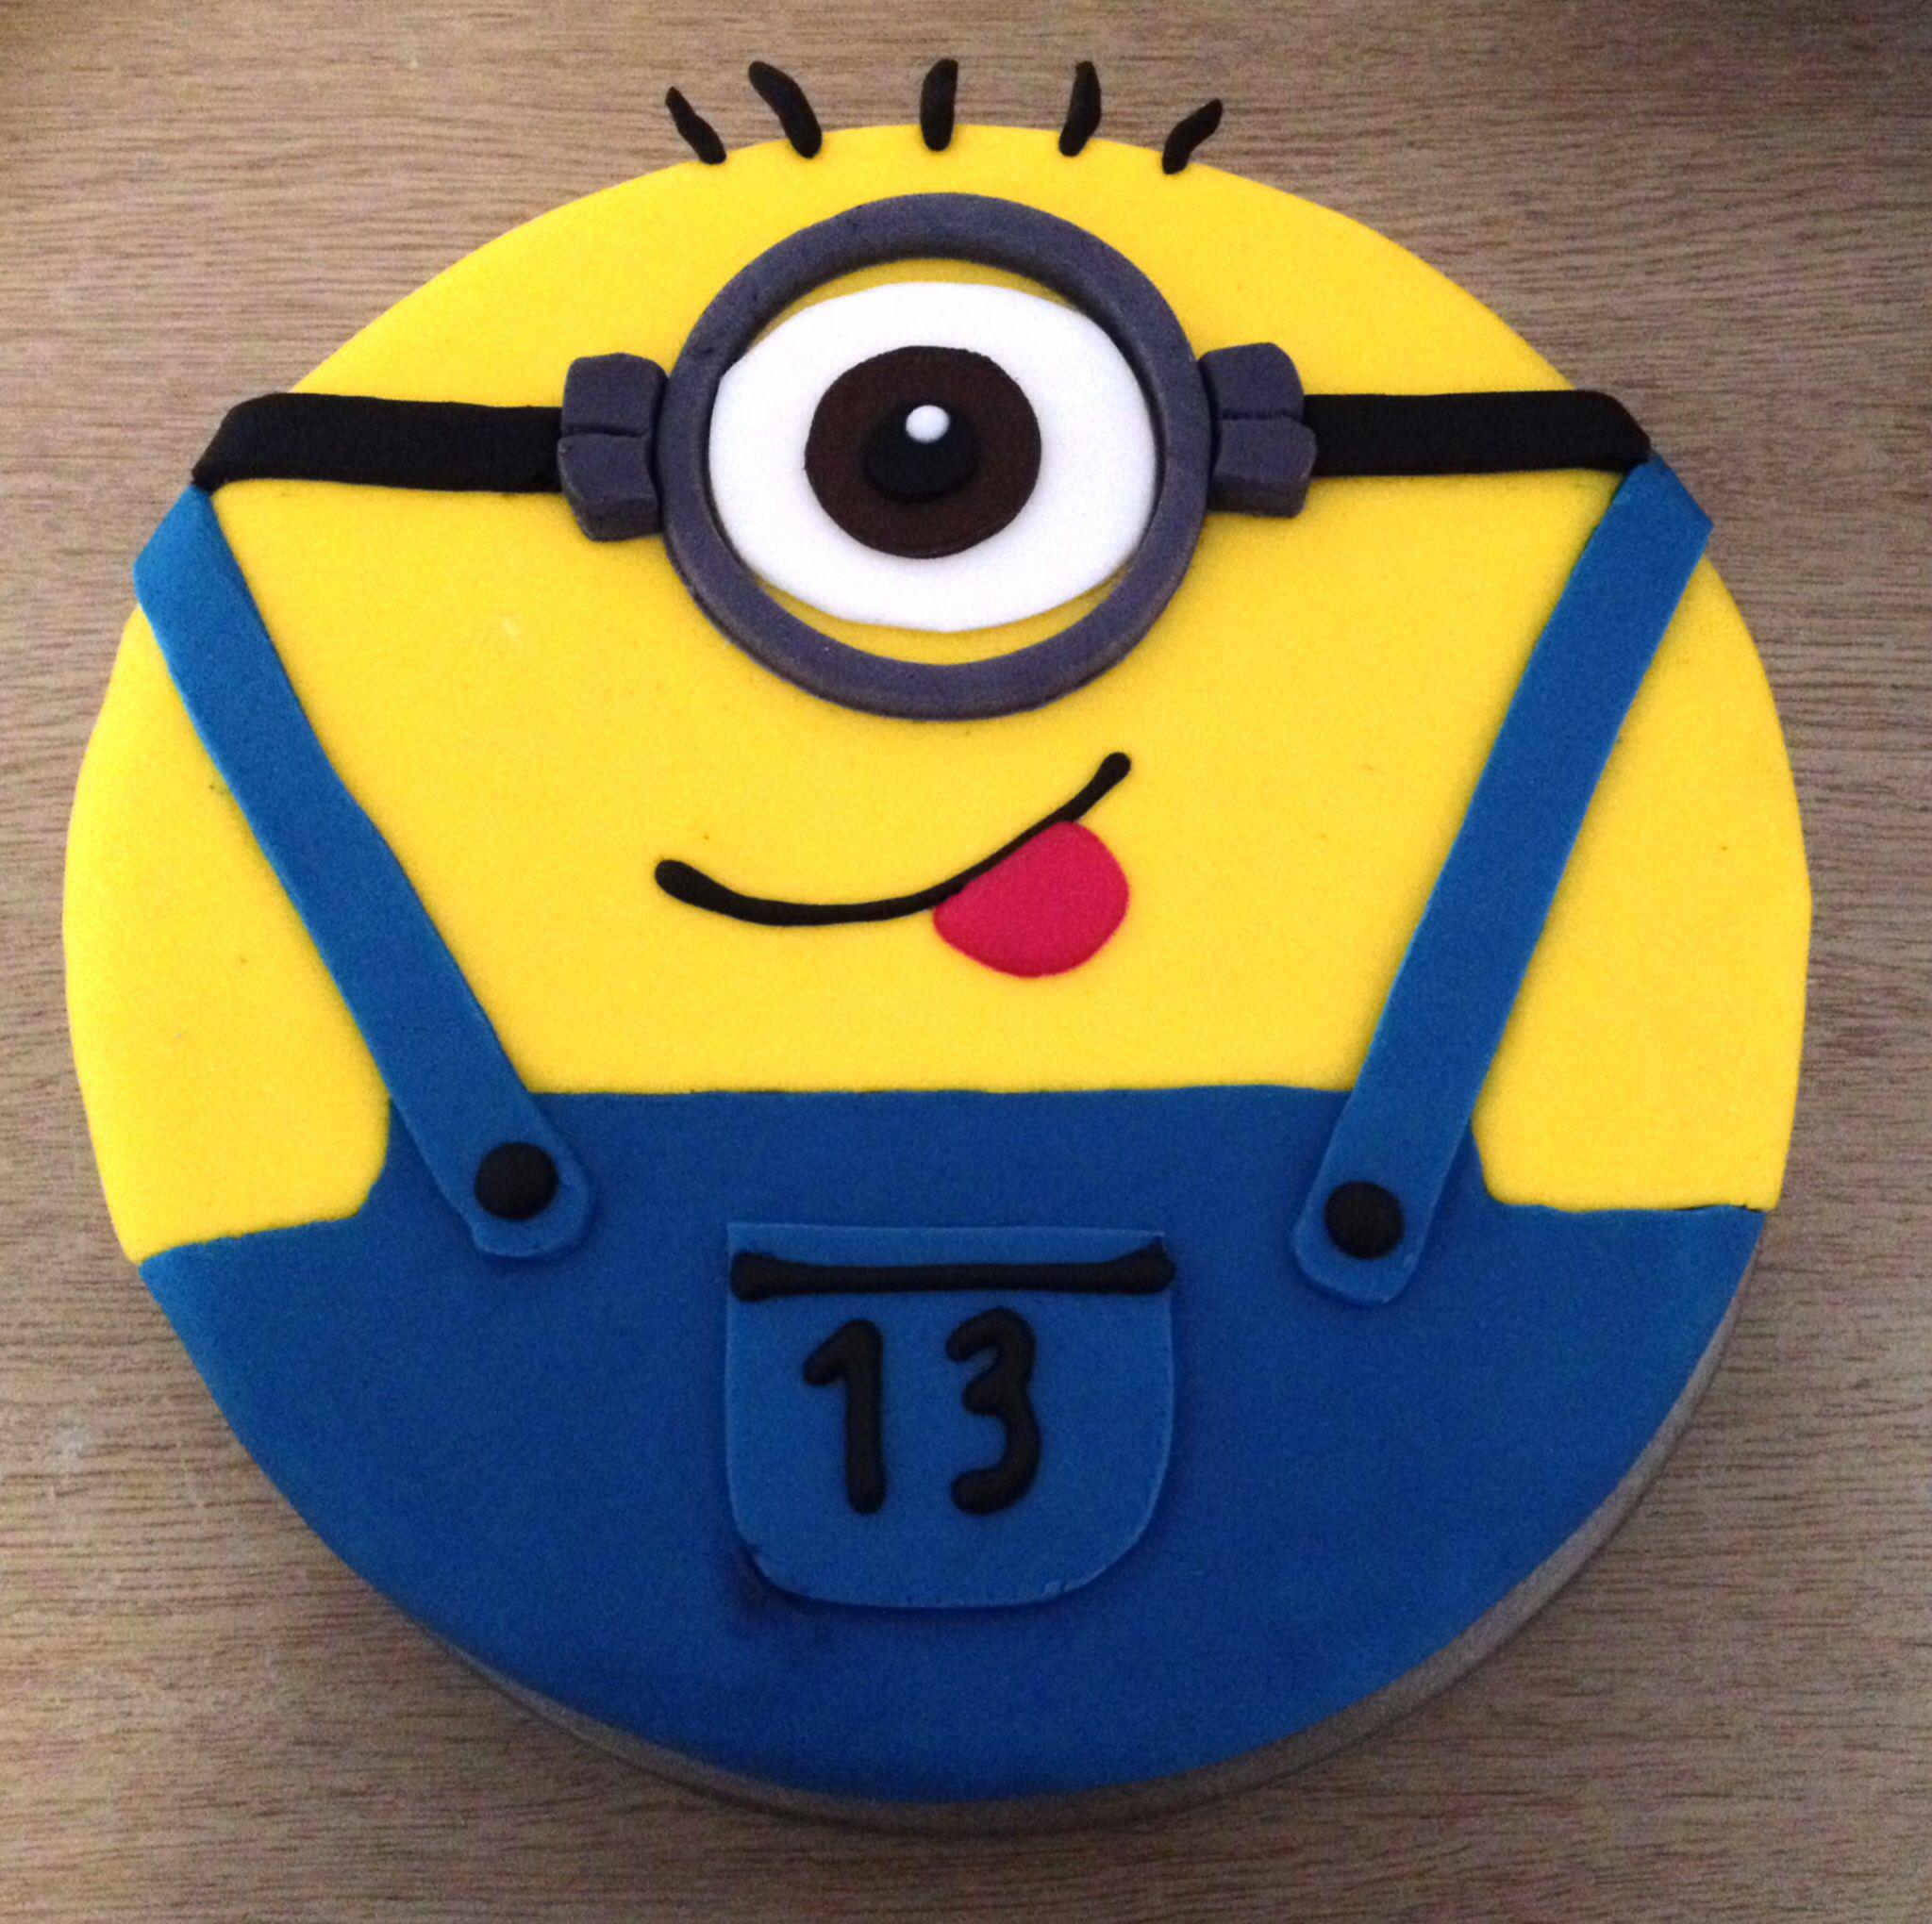 Minion cake | Recettes | Pinterest | Motivtorten, Minion ...